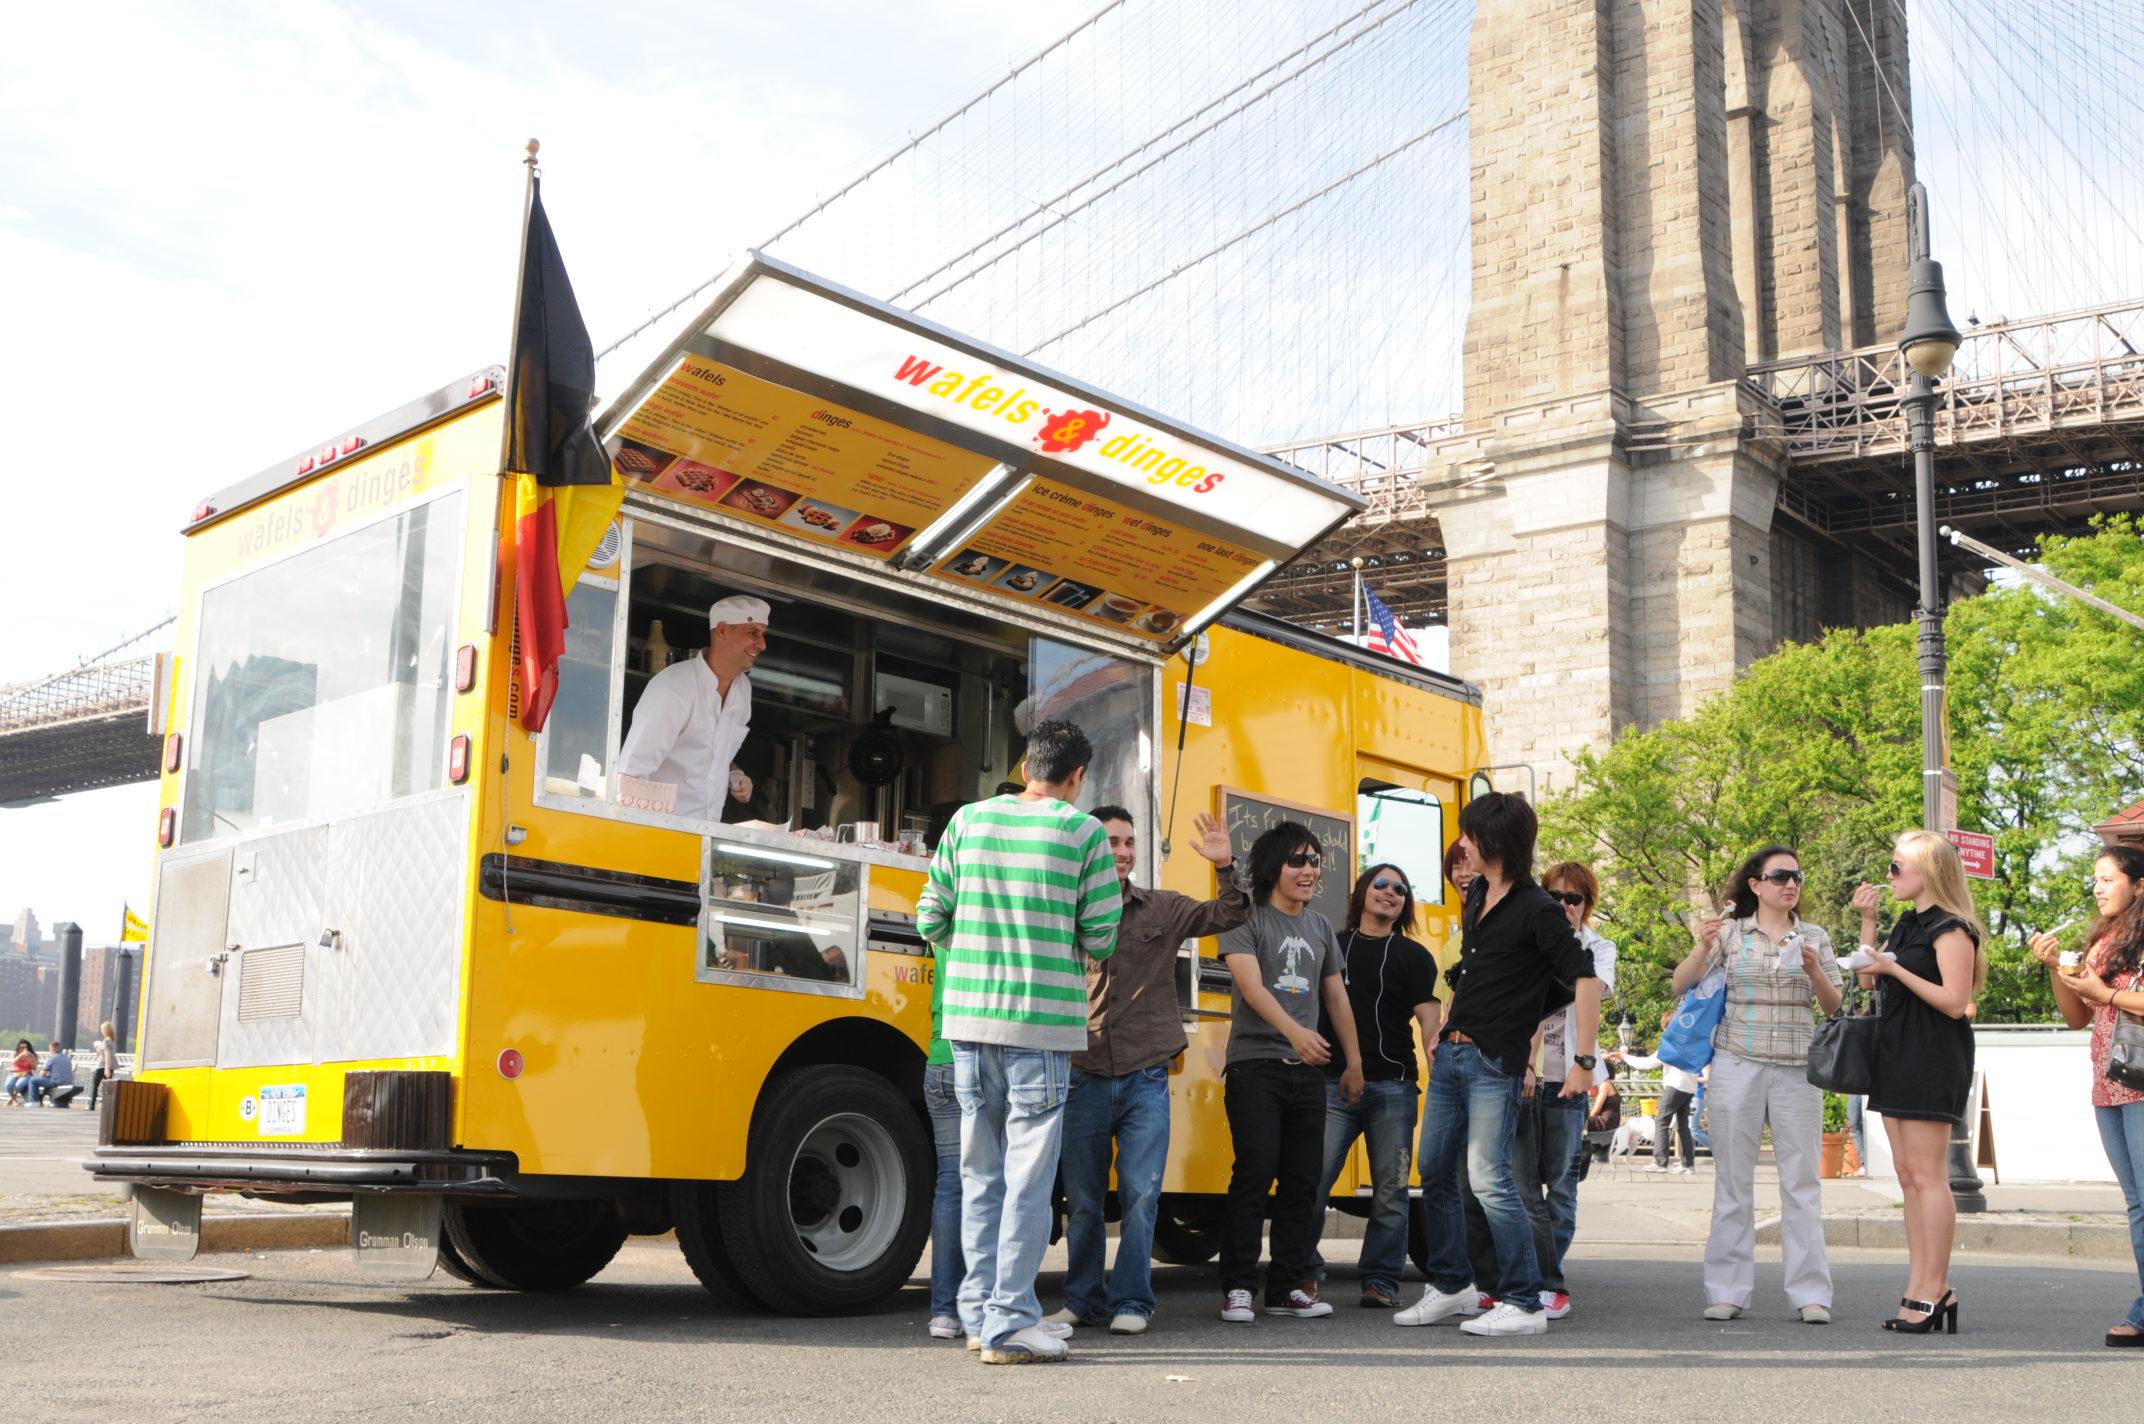 wafels and dinges food truck